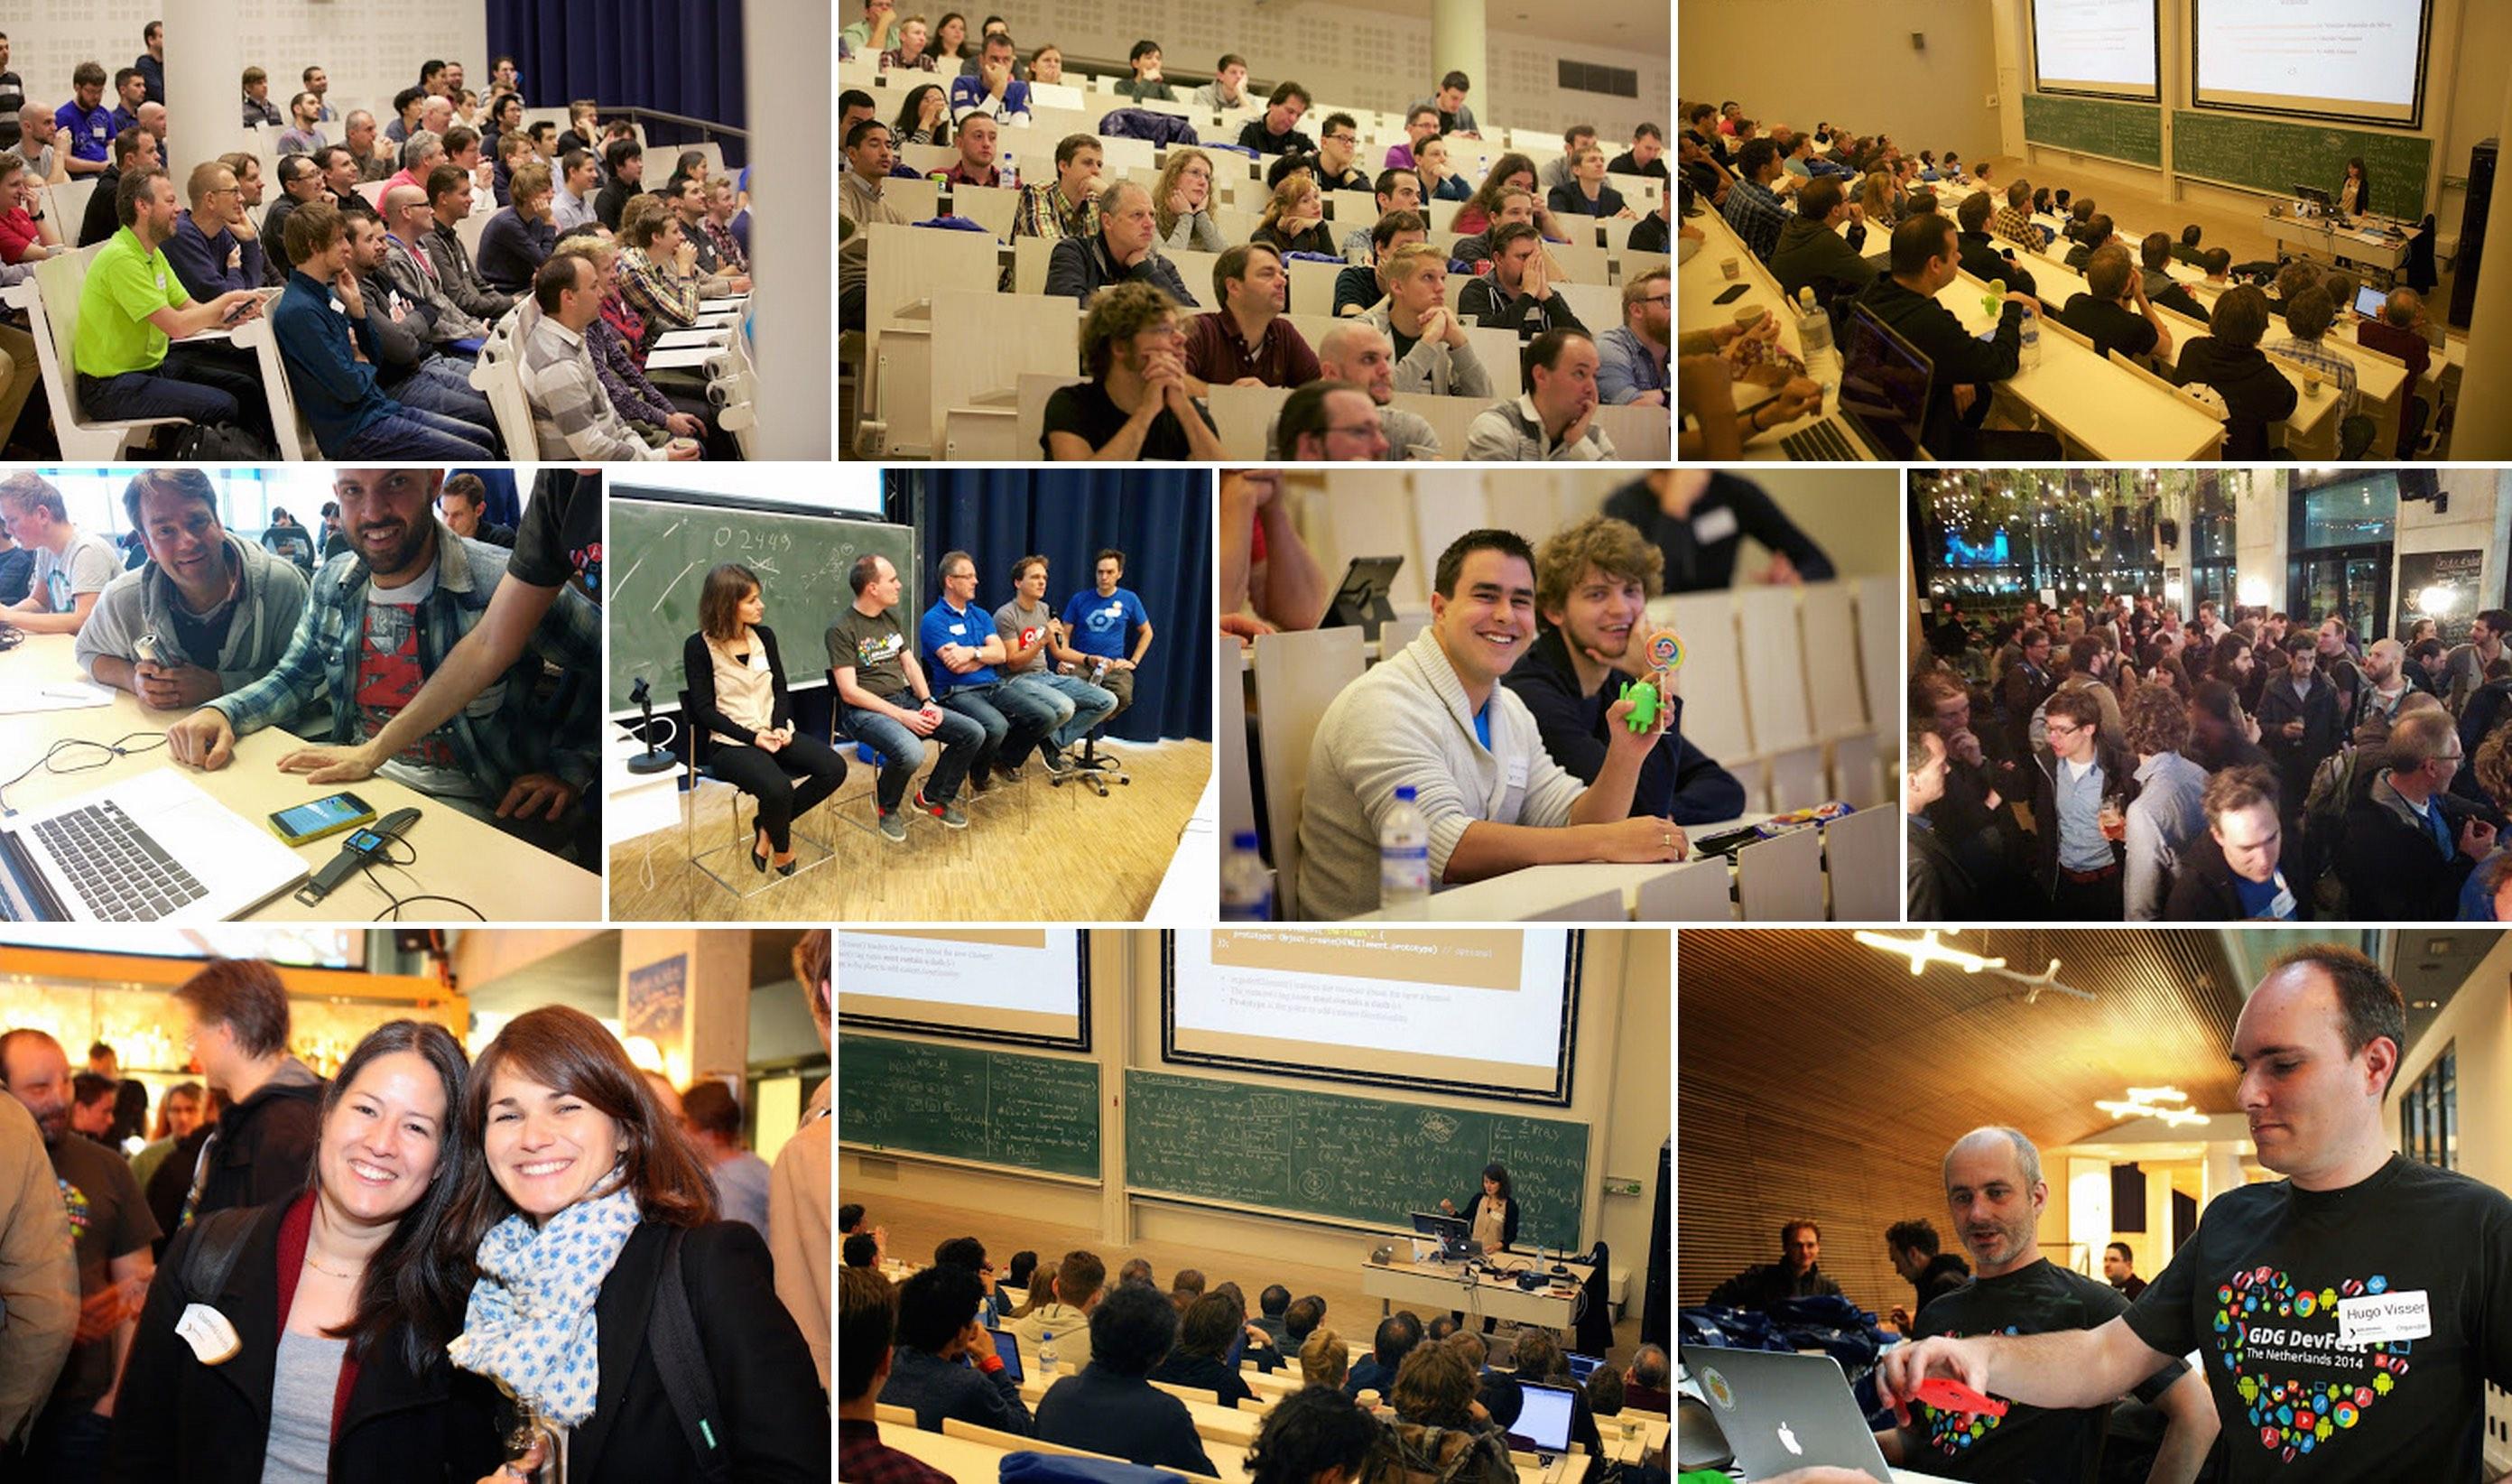 GDG DevFest 2014